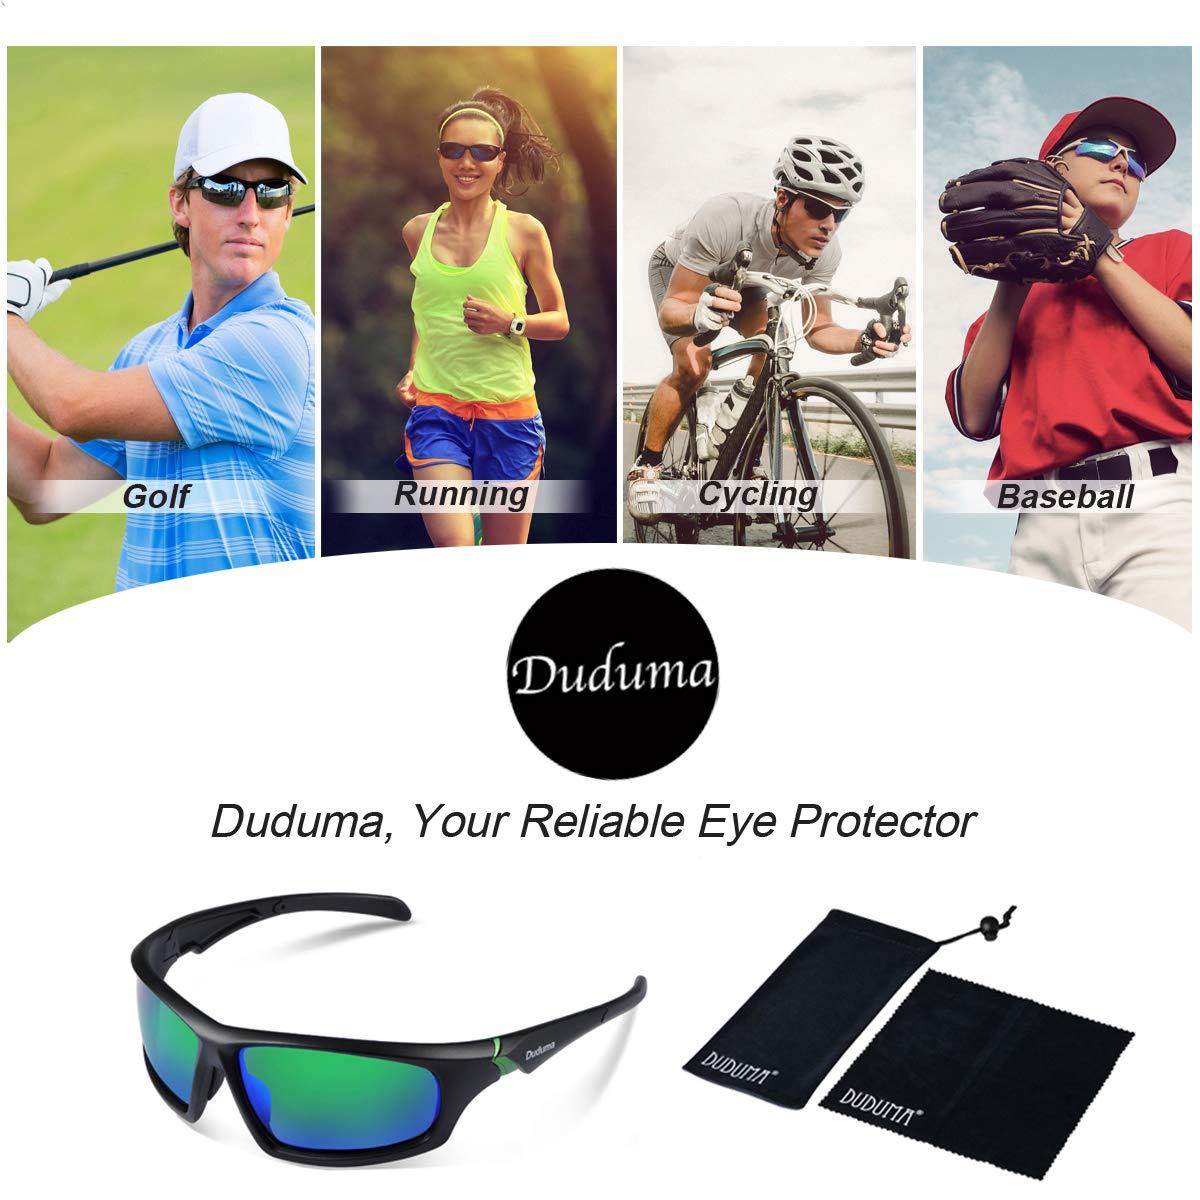 db714612807 Duduma Tr601 Polarized Sports Sunglasses for Baseball Cycling Fishing Golf  Superlight Frame (639 Black matte frame with green lens)  Amazon.co.uk   Sports   ...